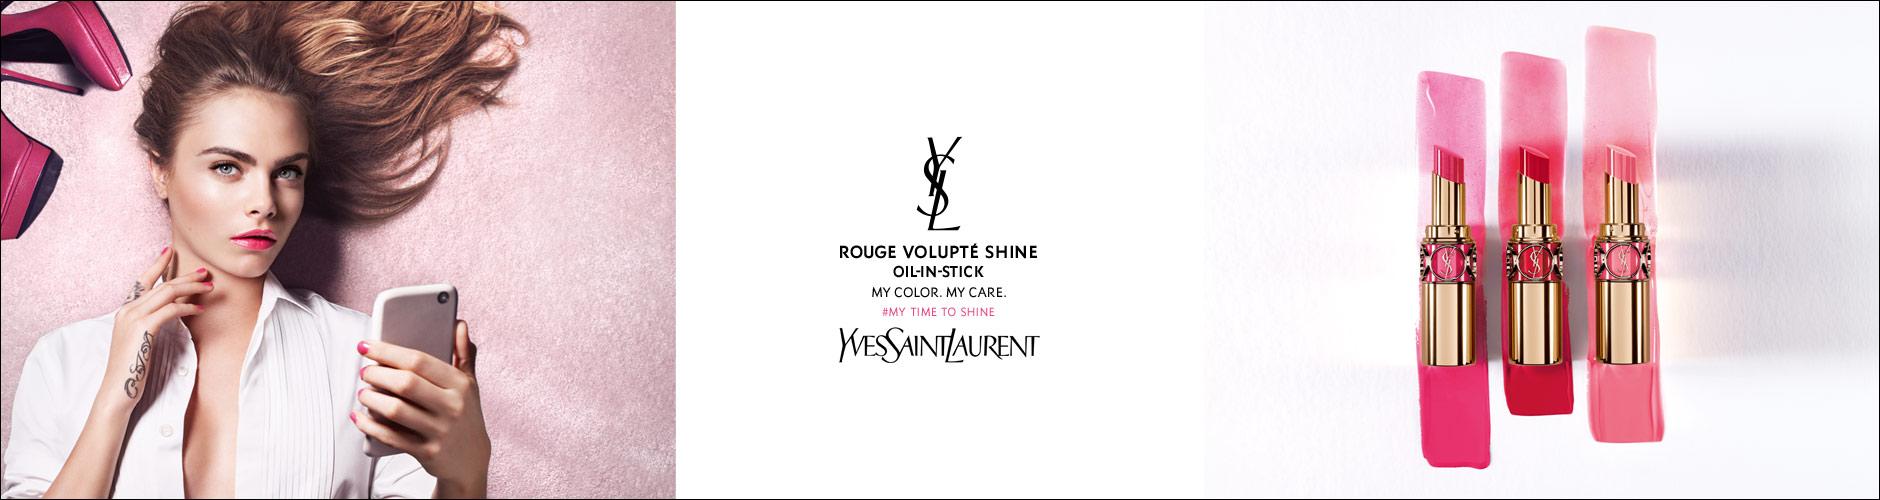 YSL, Yves Saint Laurent \u0026amp; YSL Beauty | Neiman Marcus